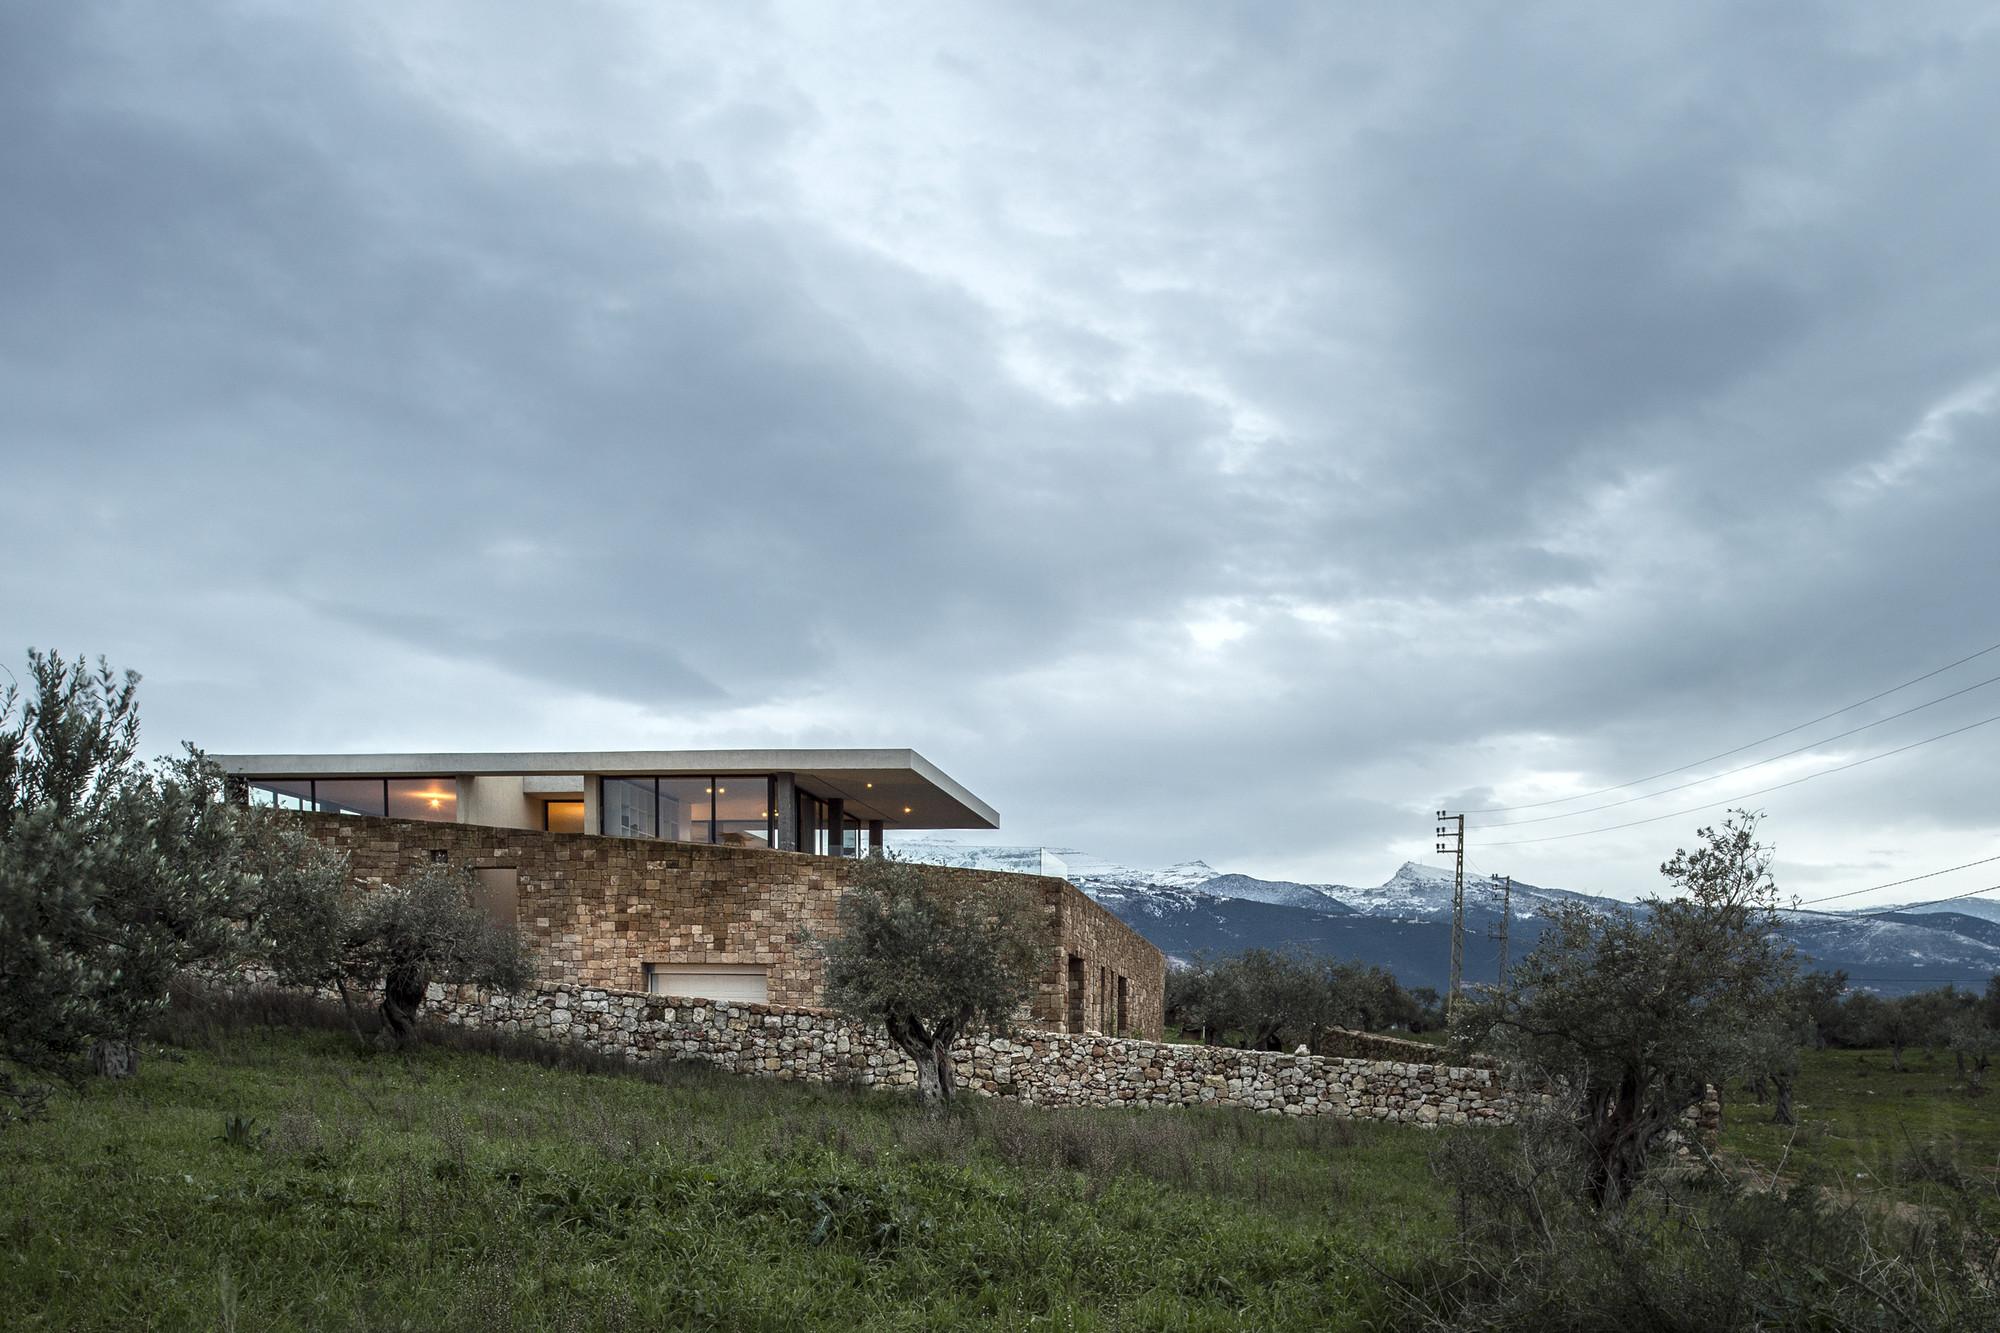 Casa en Zgharta / platau, © Ieva Saudargaite